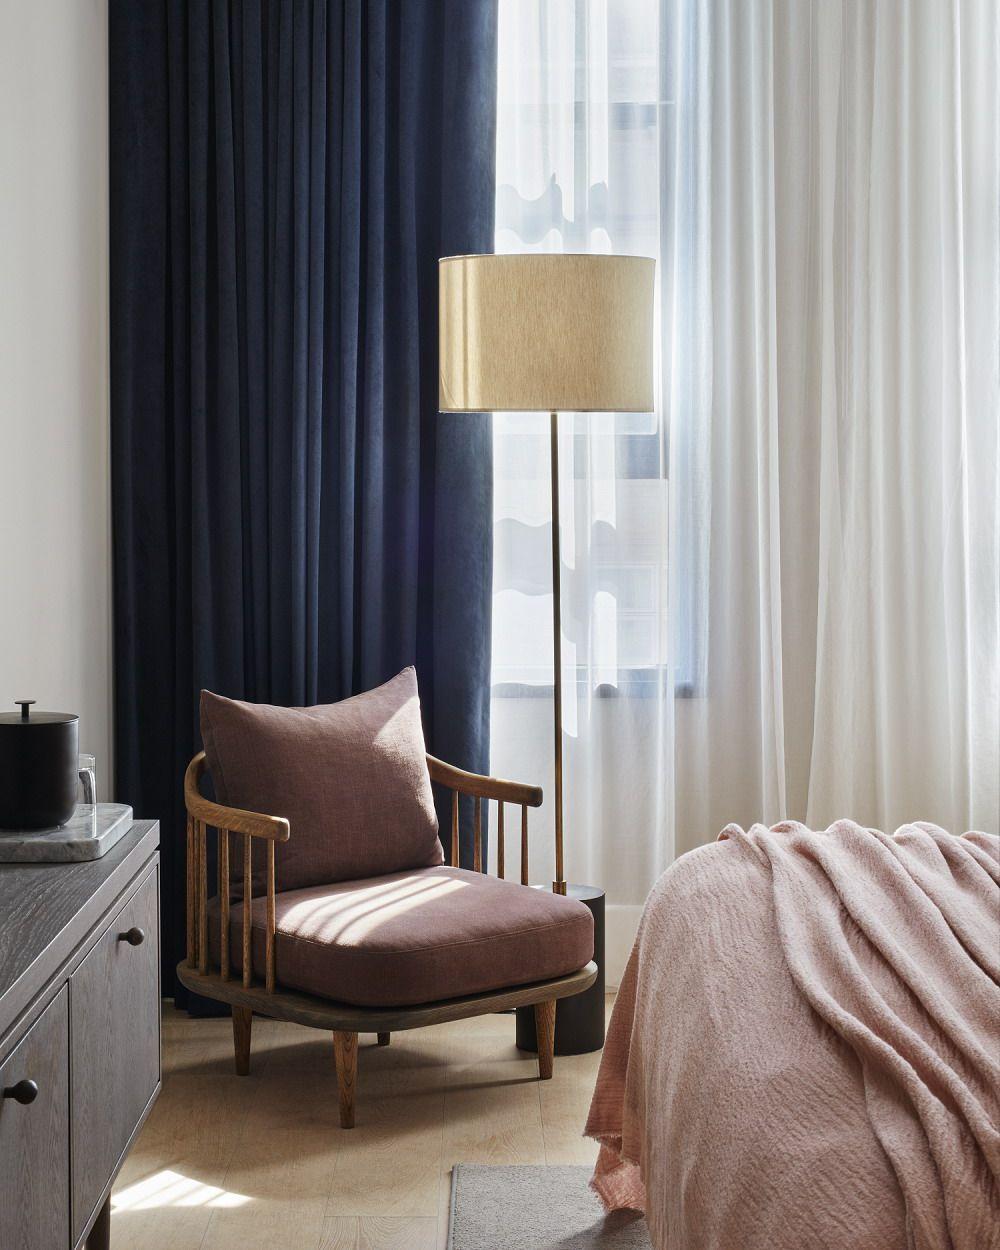 11 howard hotel in soho by space copenhagen design hotel slaapkamerdecoratie gezellige slaapkamer